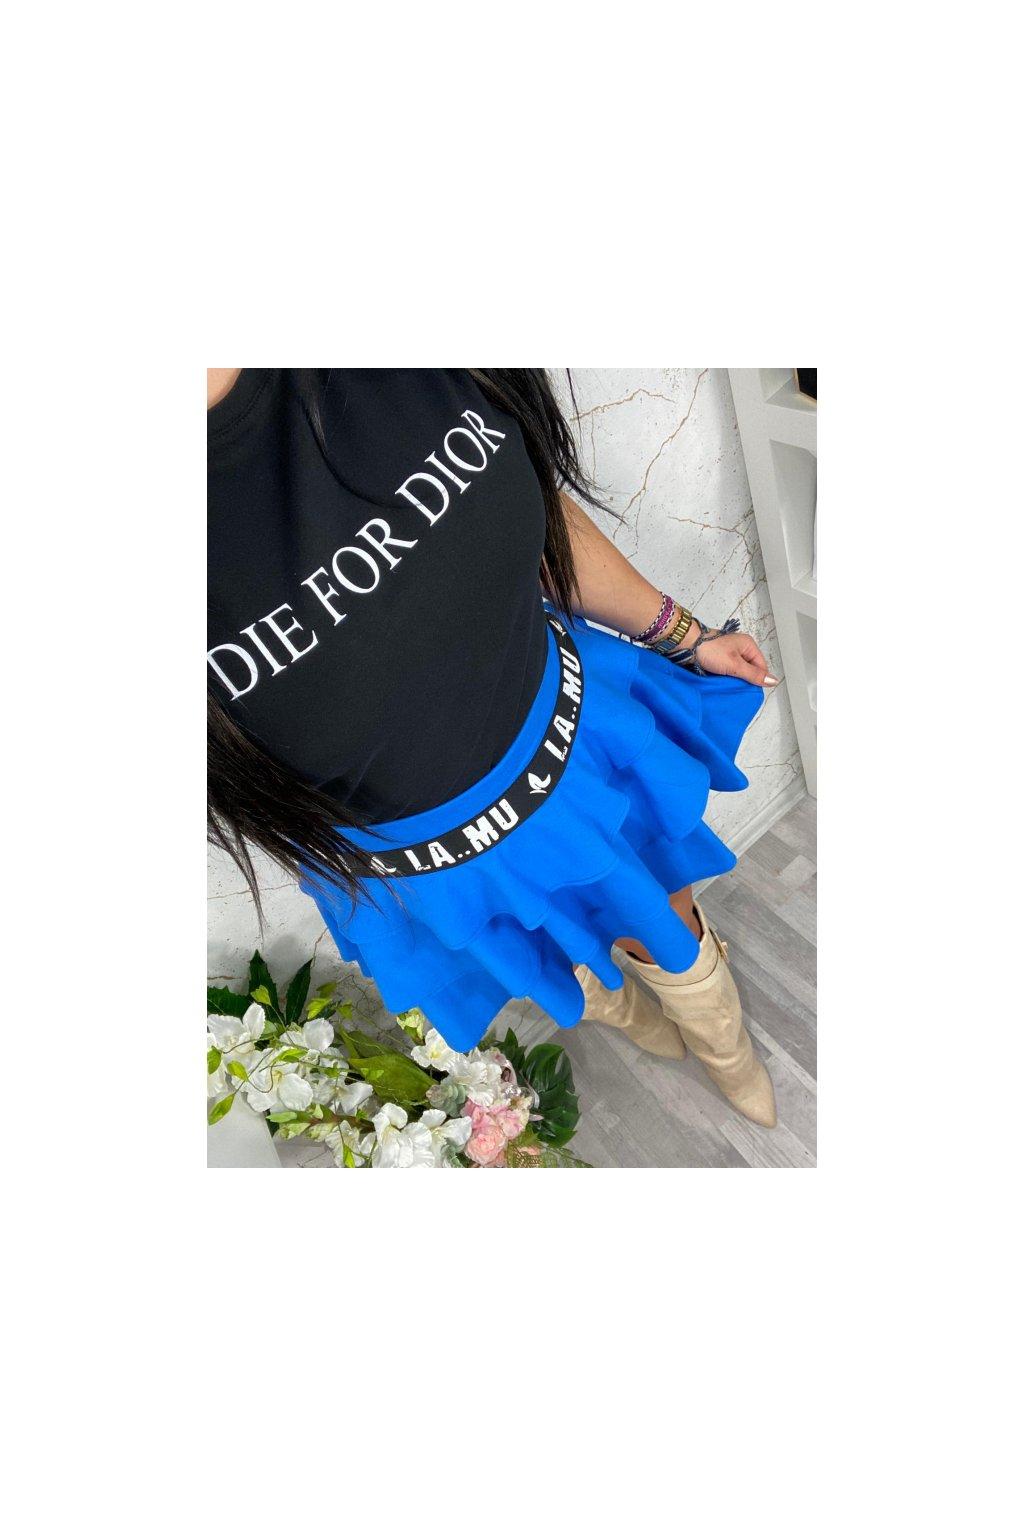 Super triko Die for Dior